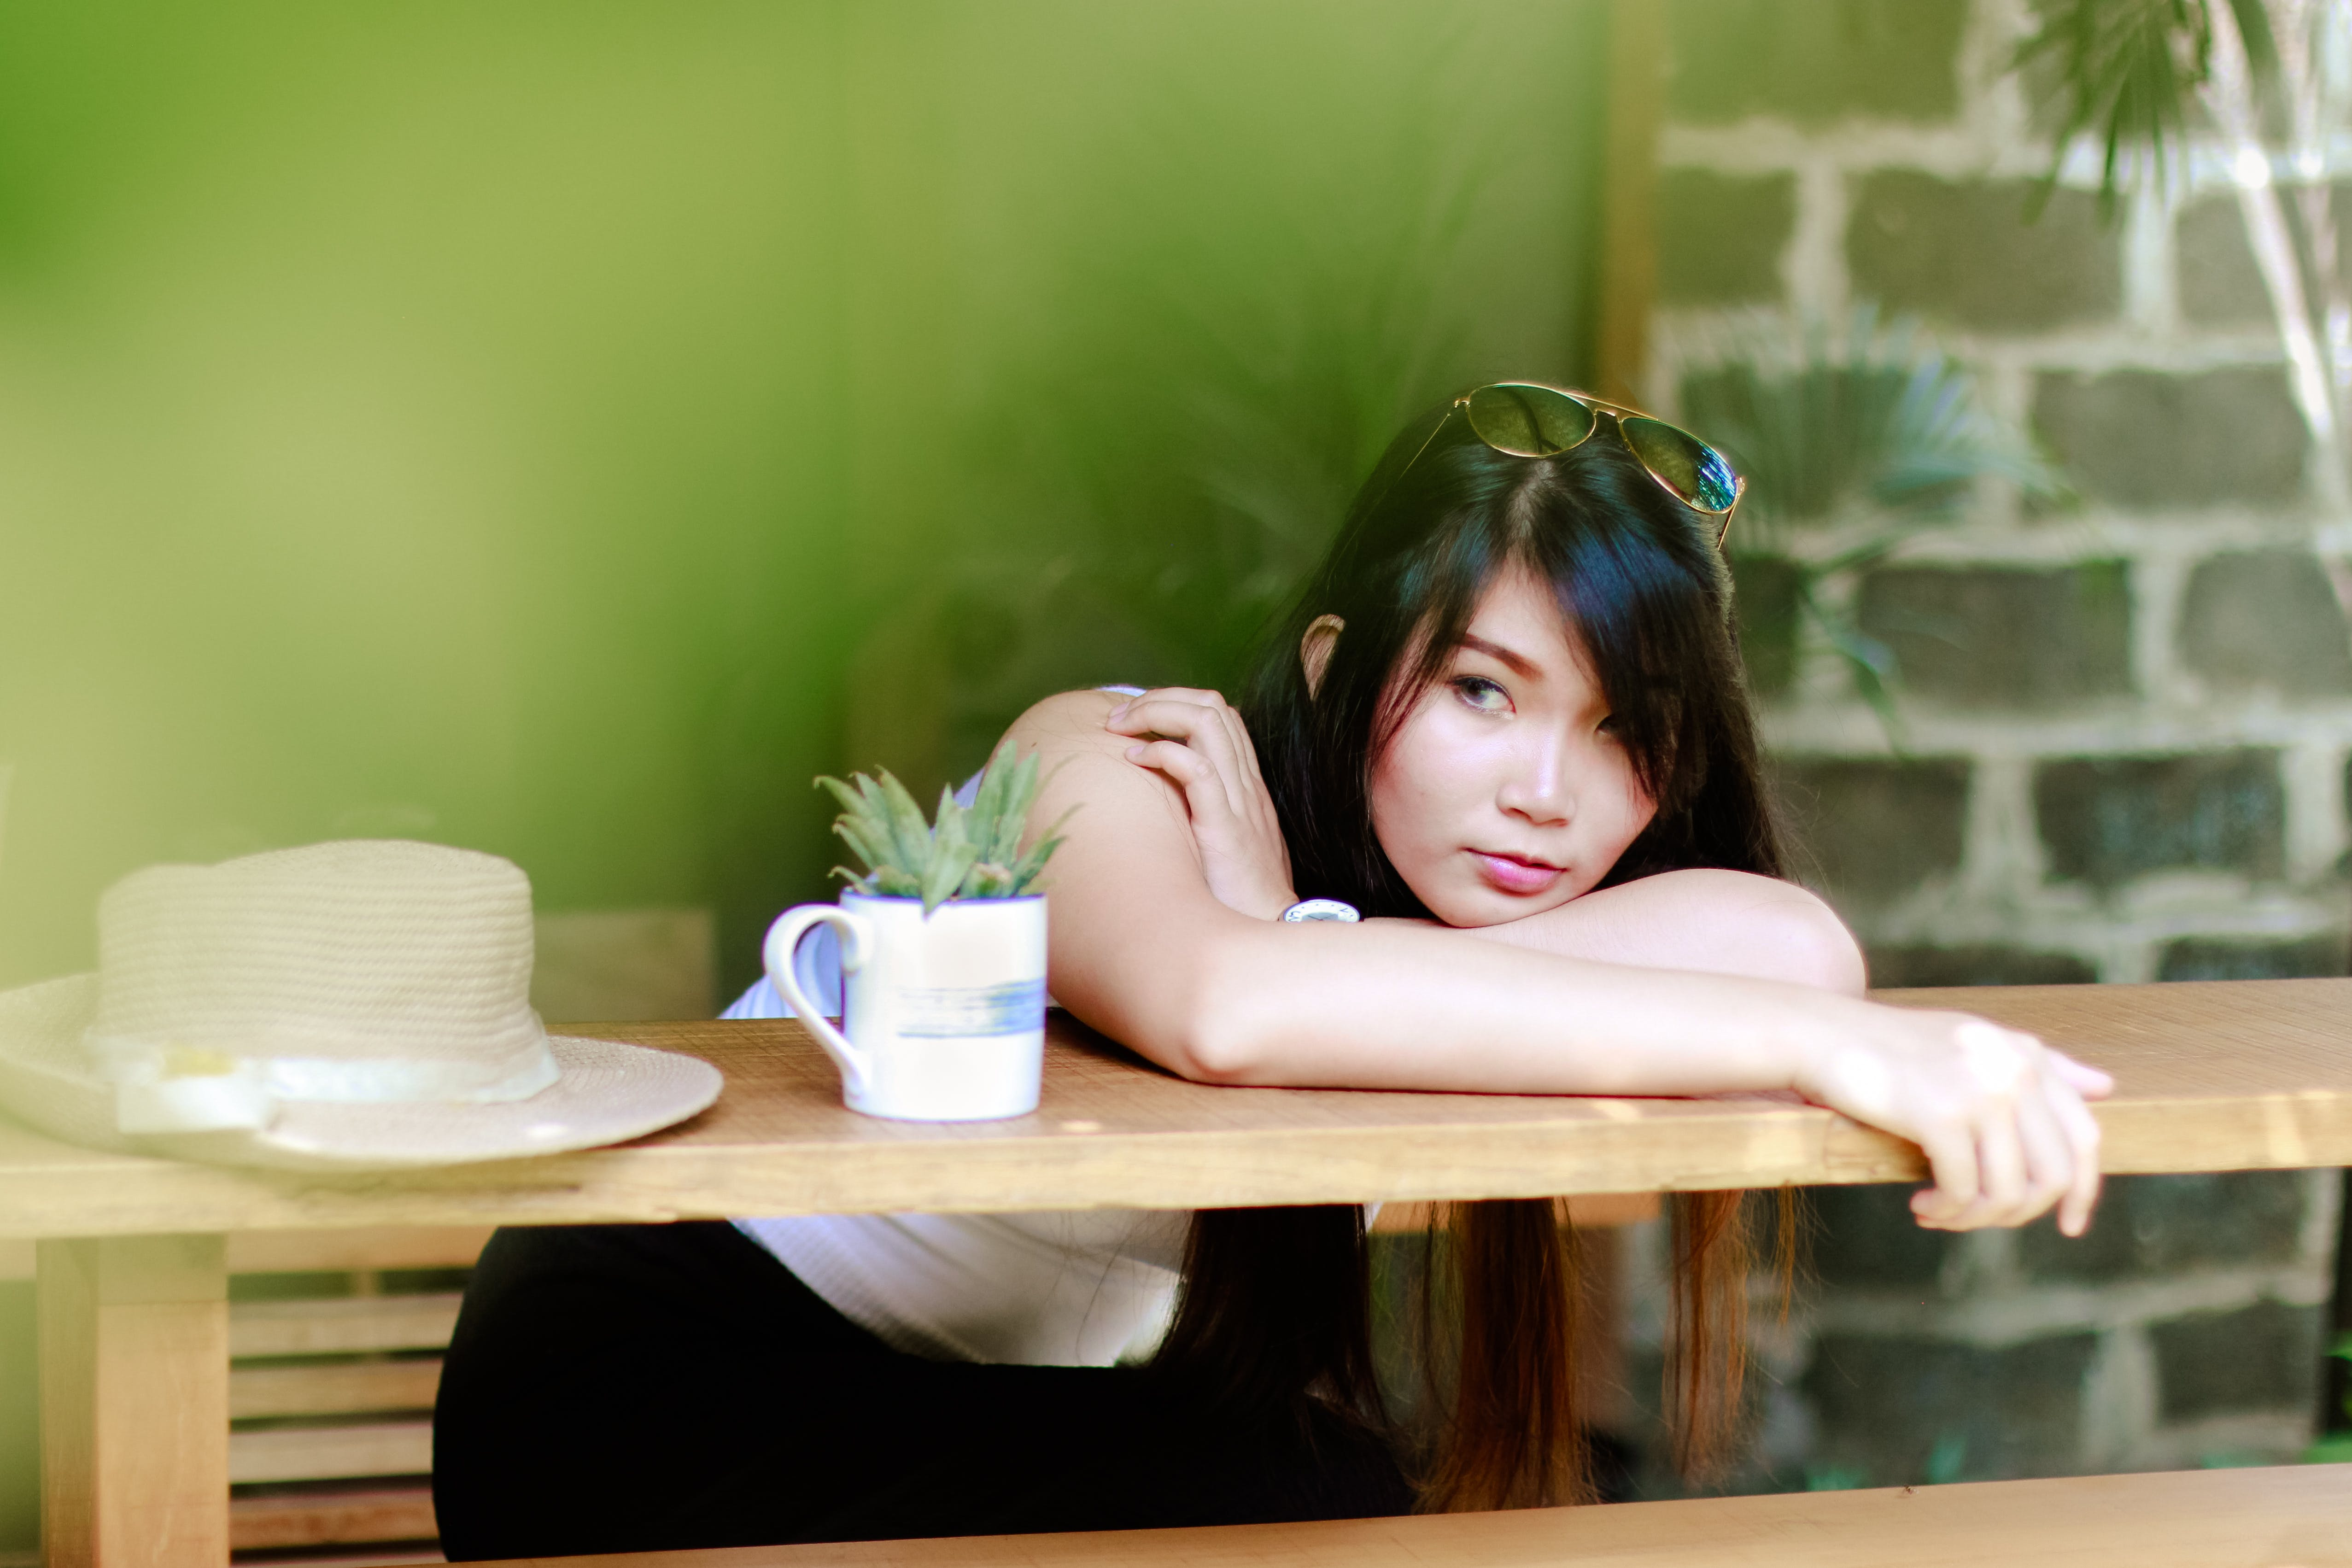 Woman Wearing White Shirt Sitting Near Table